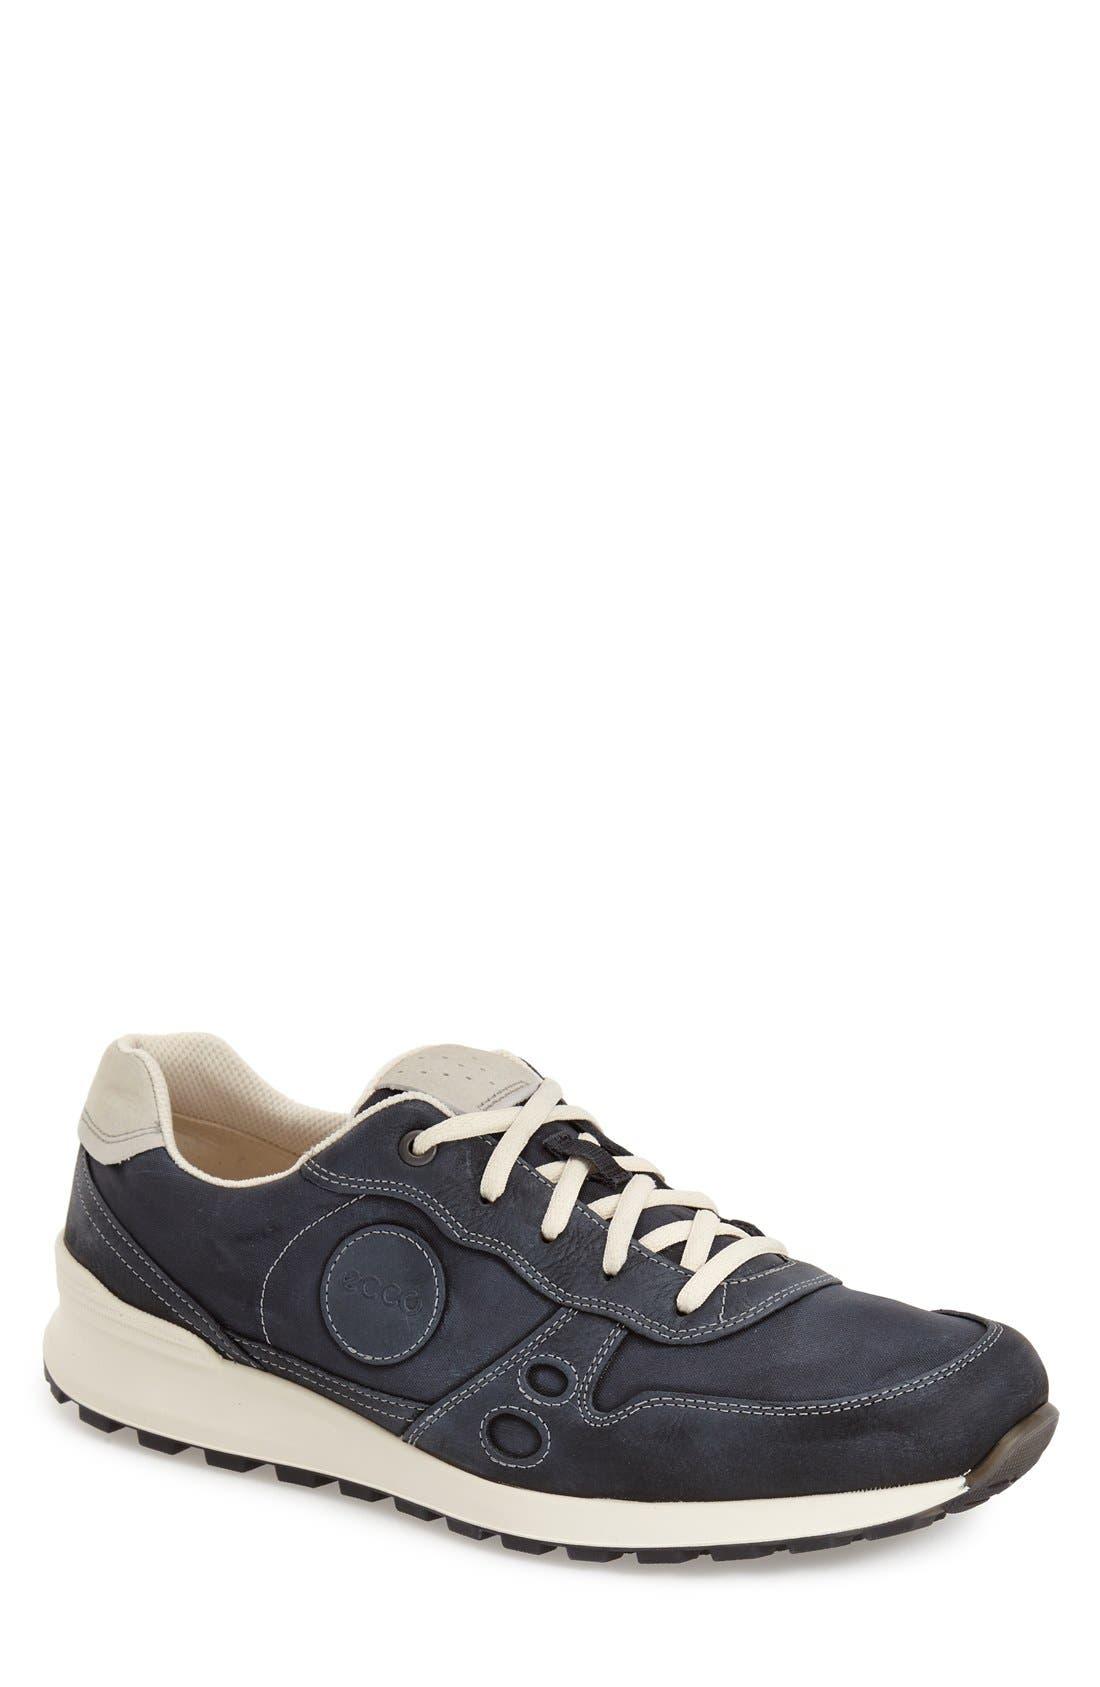 'CS14' Sneaker,                             Main thumbnail 1, color,                             015